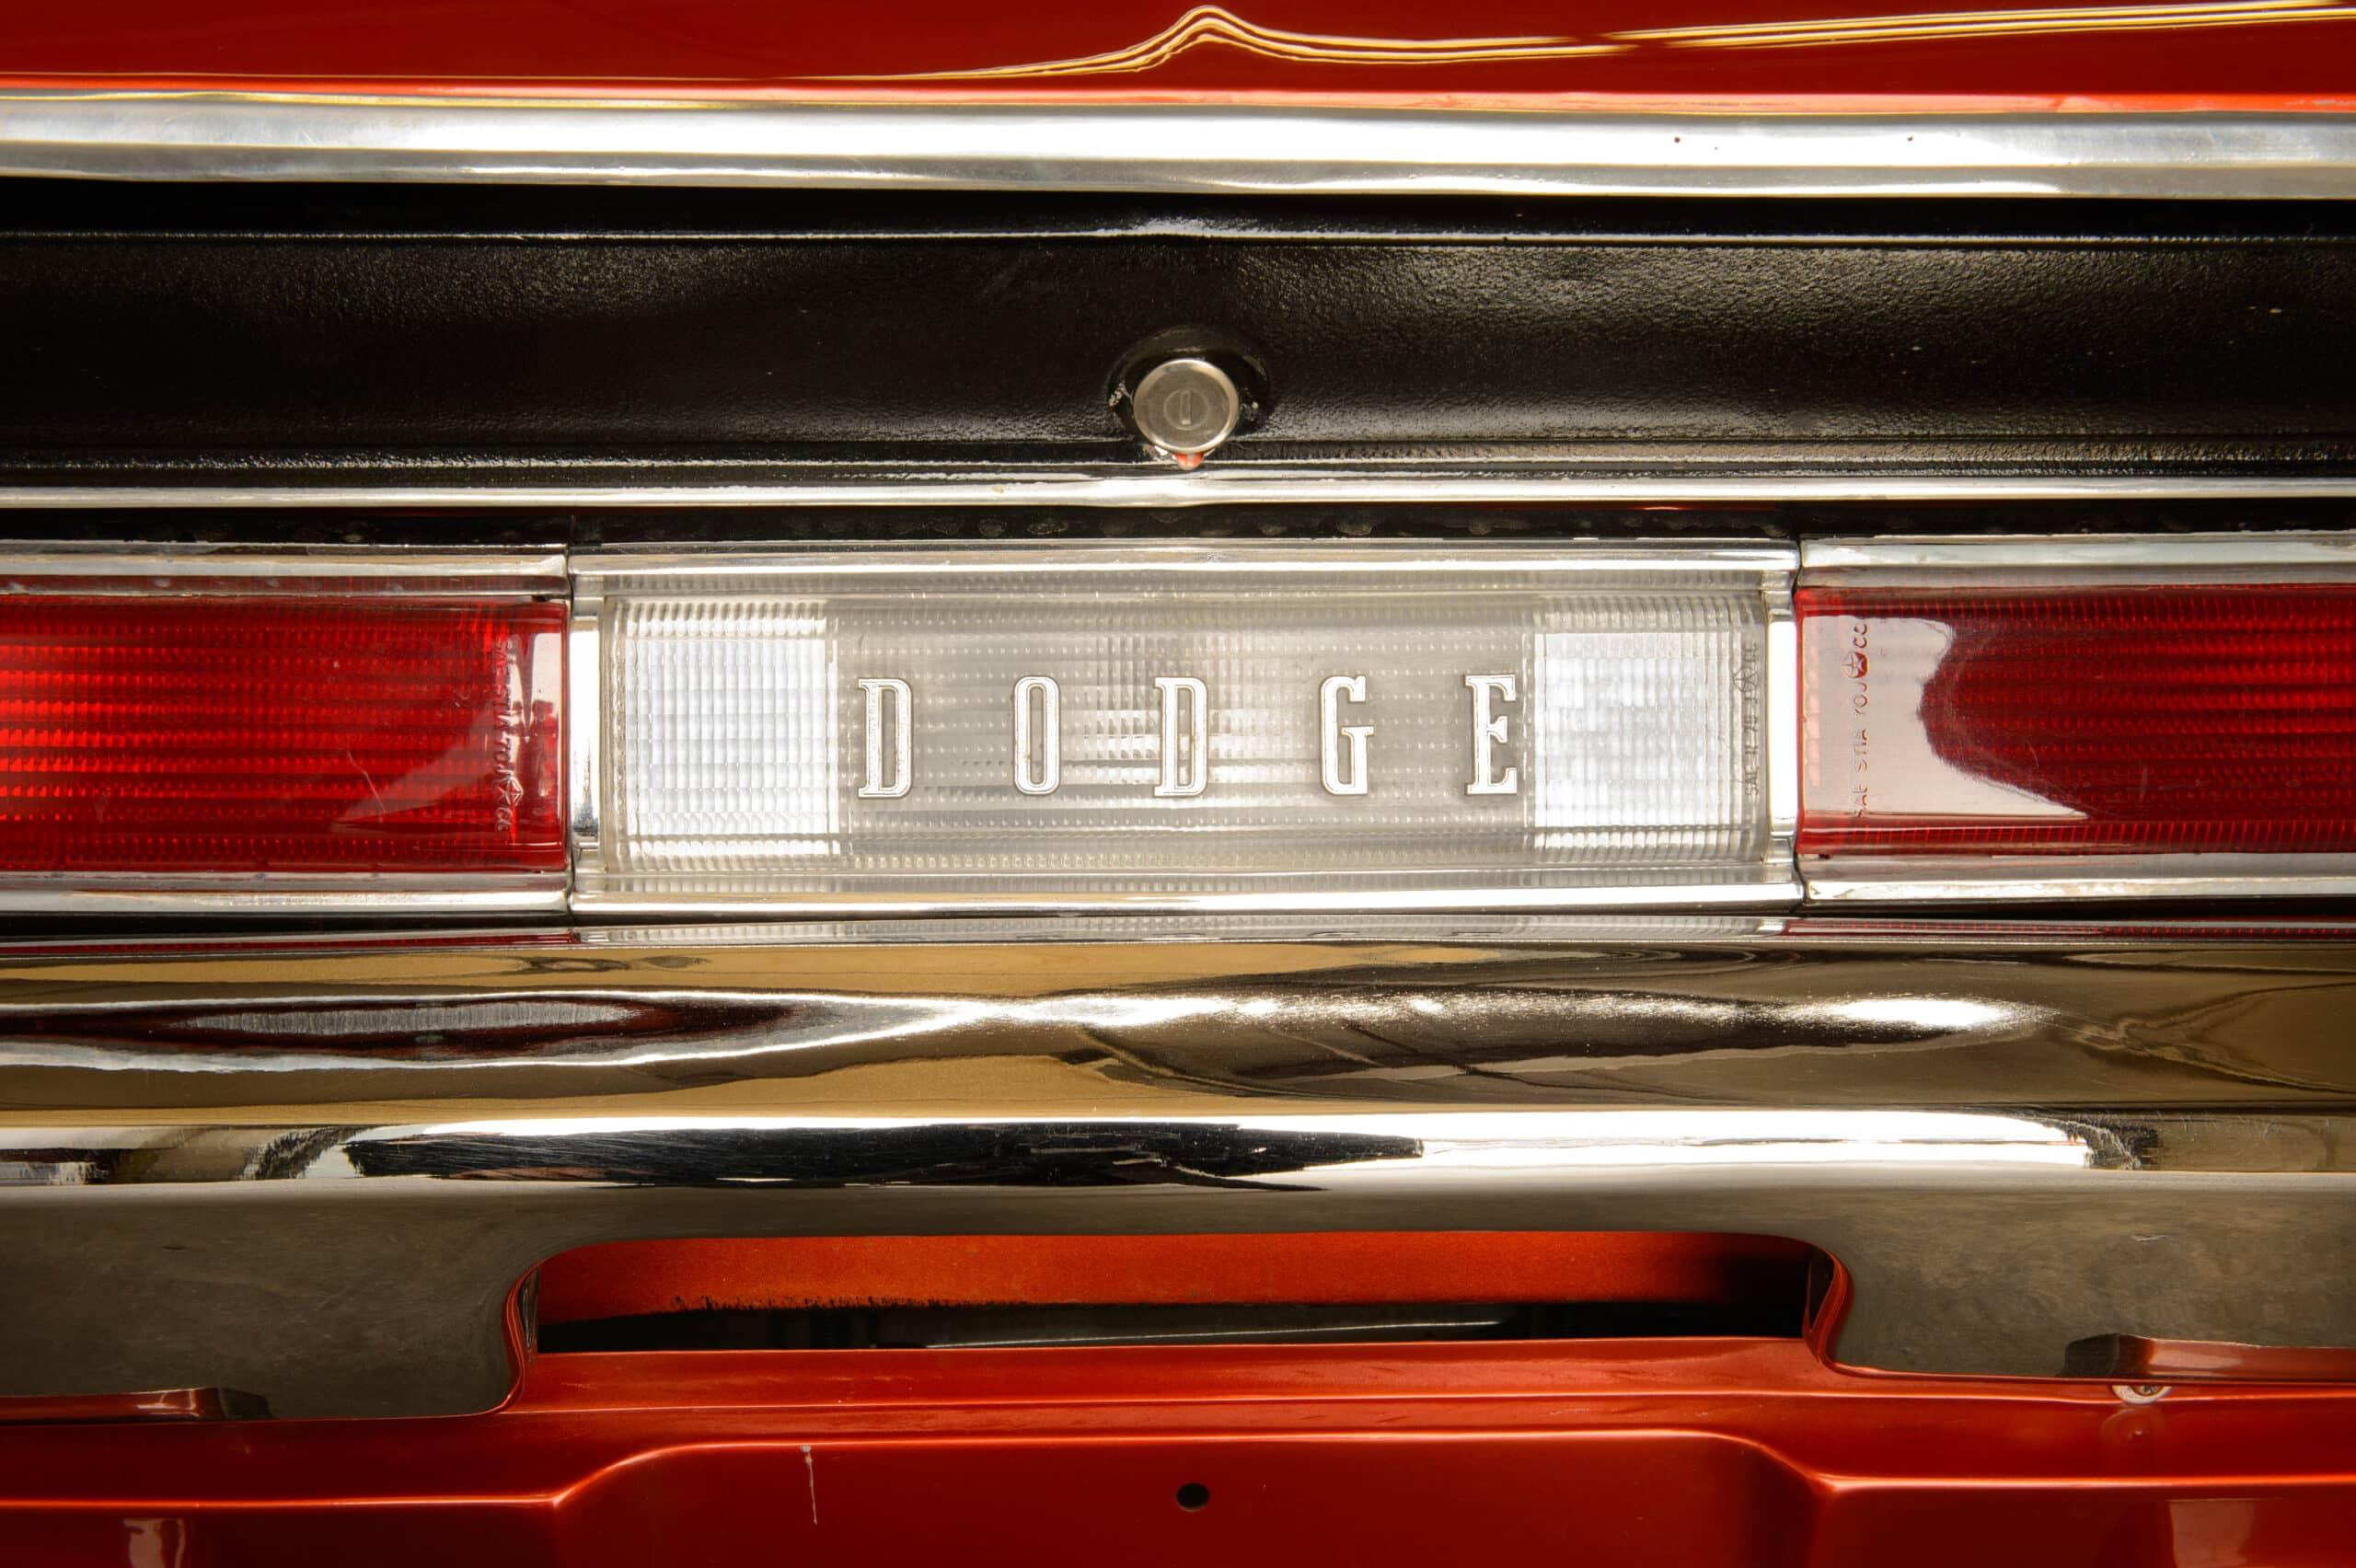 1970 Dodge Challenger R/T SE Hemi